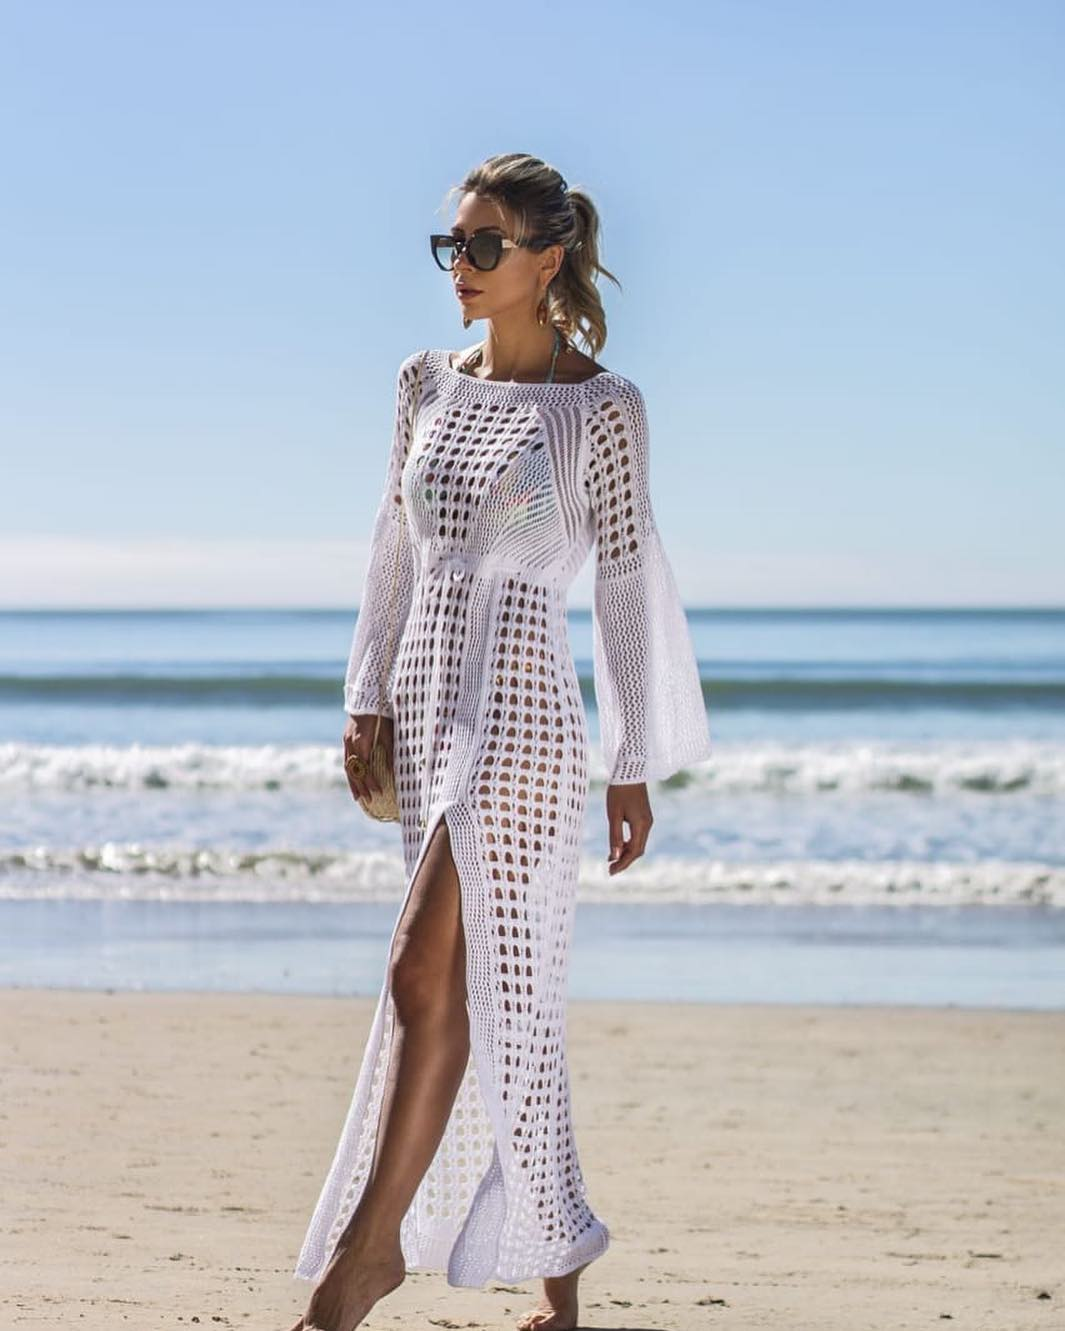 b93e7eebd2c3 Saída de praia longa: 60 looks elegantes para se inspirar